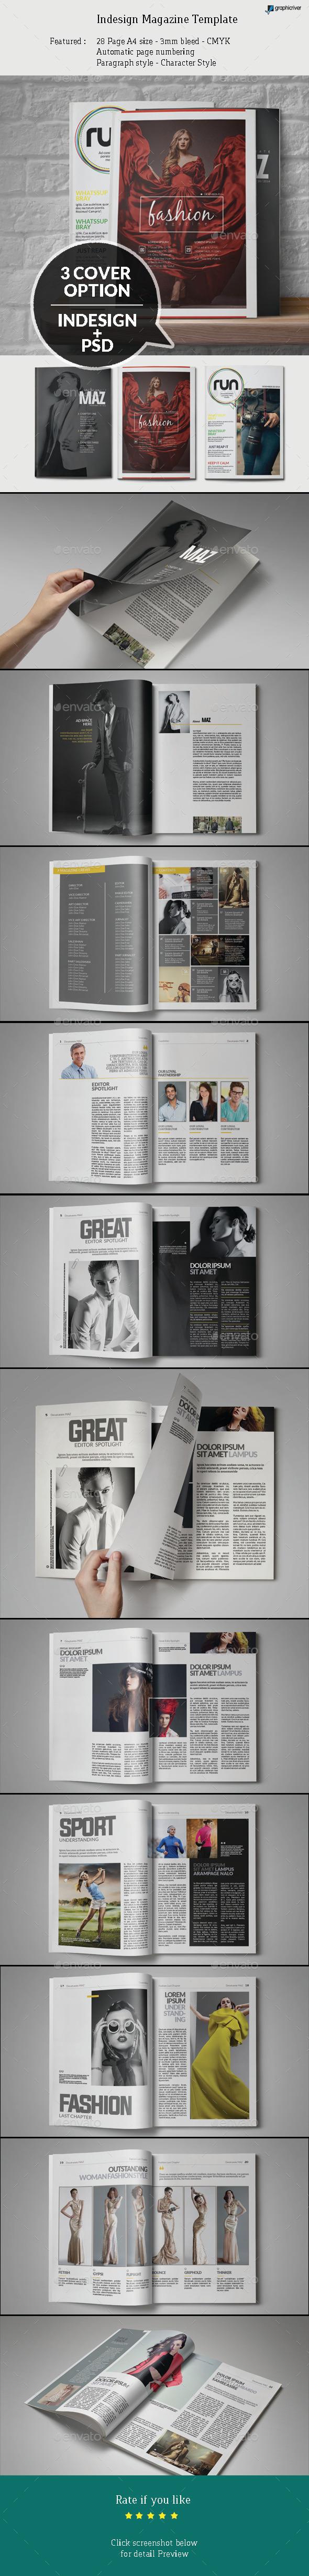 GraphicRiver Indesign Magazine Template 9387366